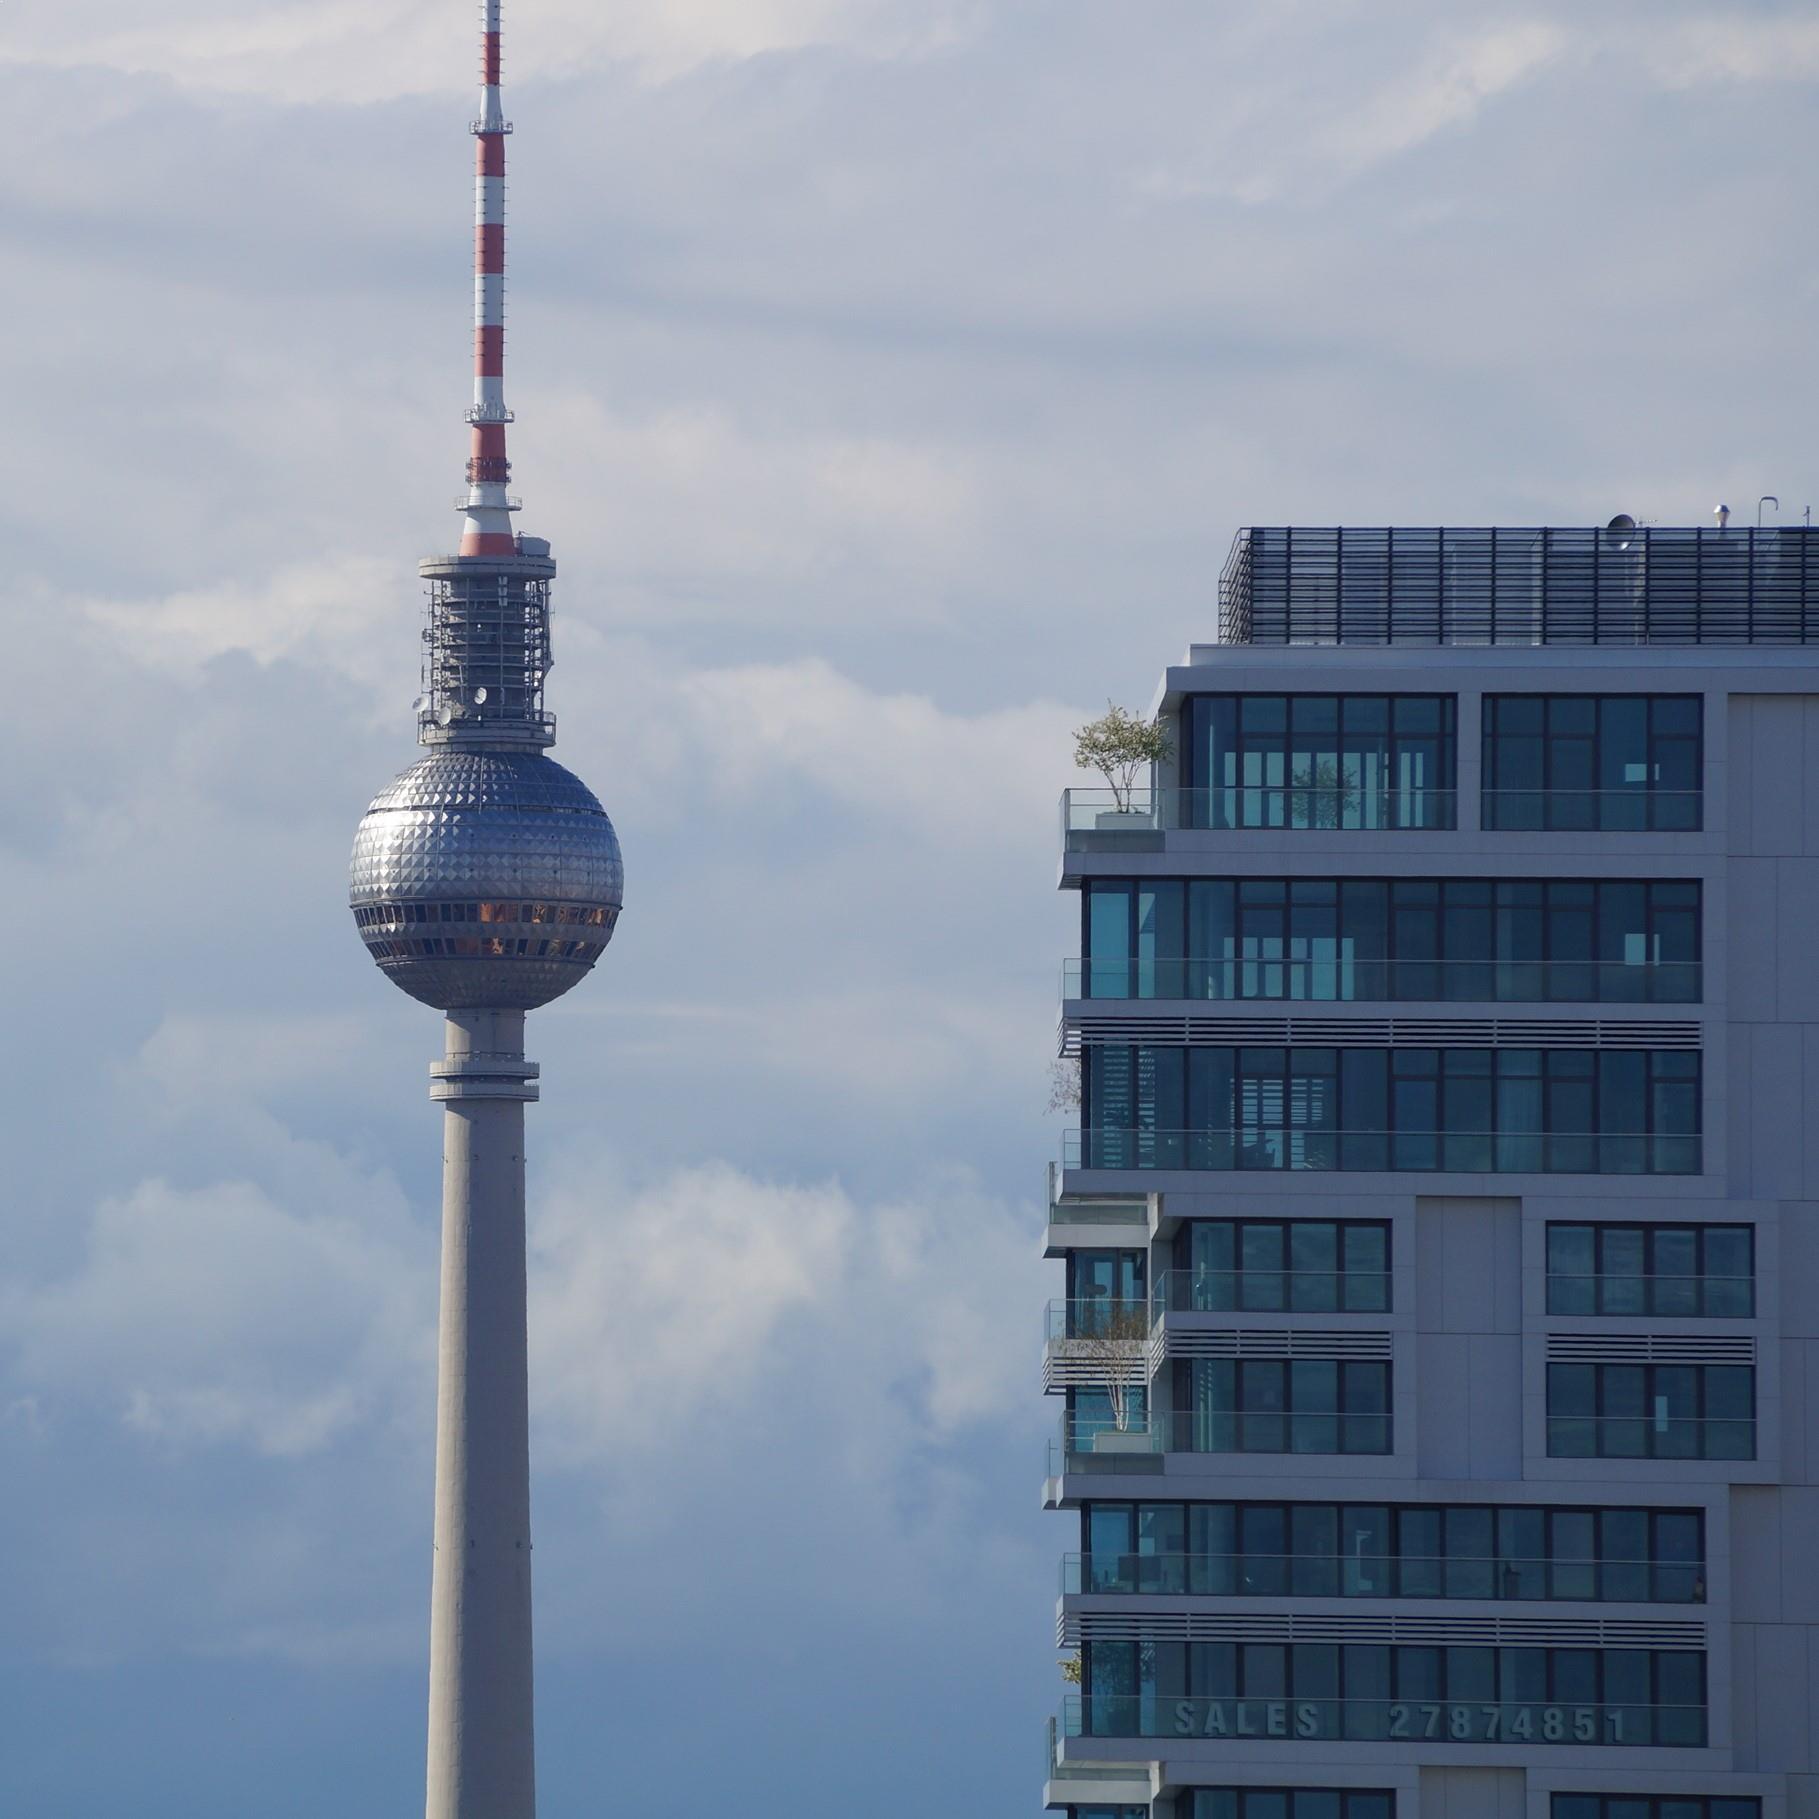 Berlin még Budapestnél is jobb célpont?